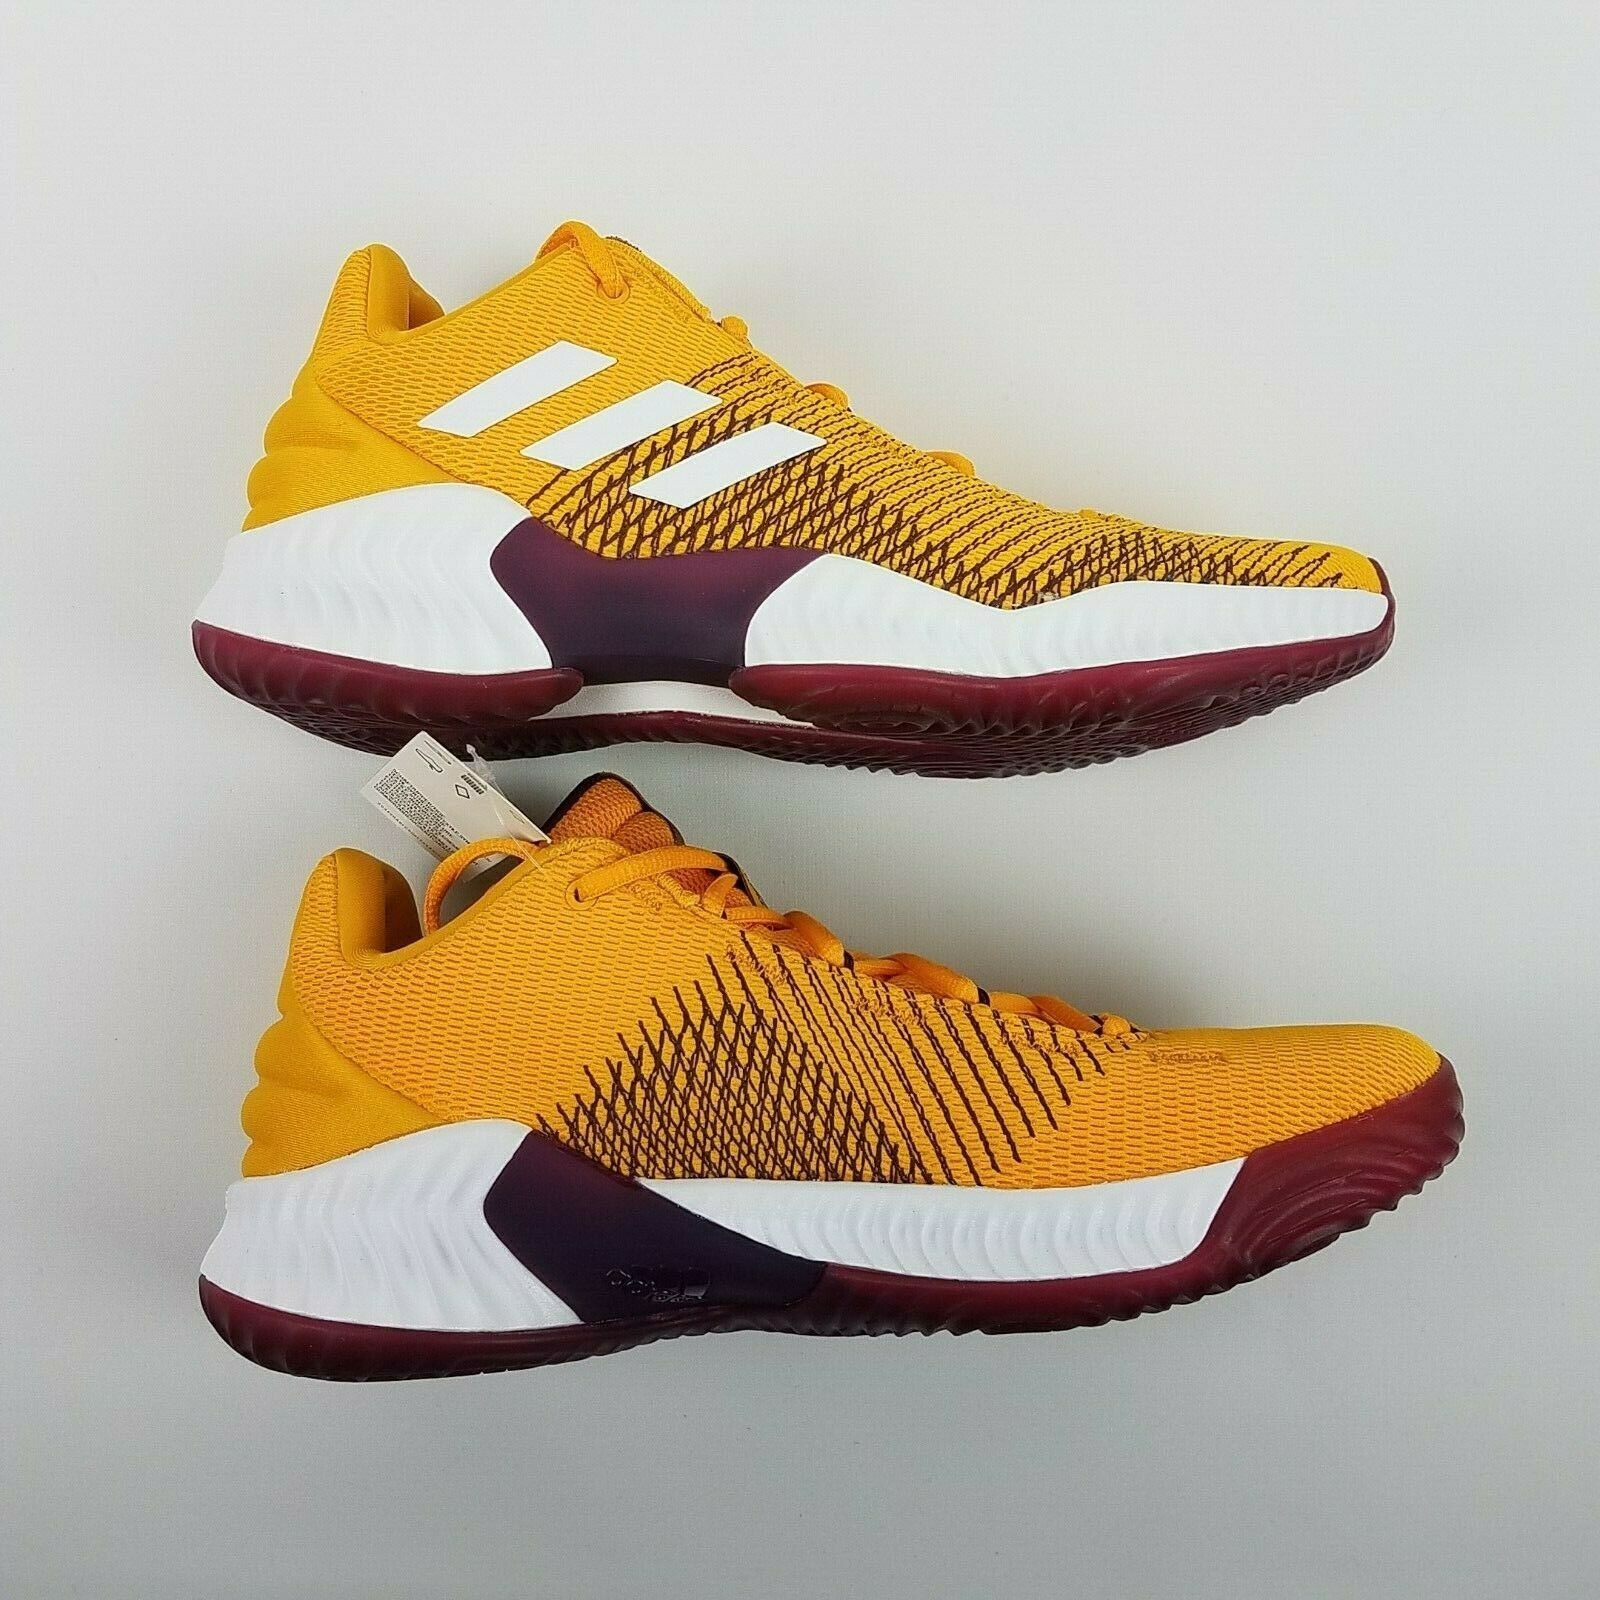 adidas Mens Pro Bounce 2018 Low ASU Basketball Shoe NCAA B41866 Size 9 image 5